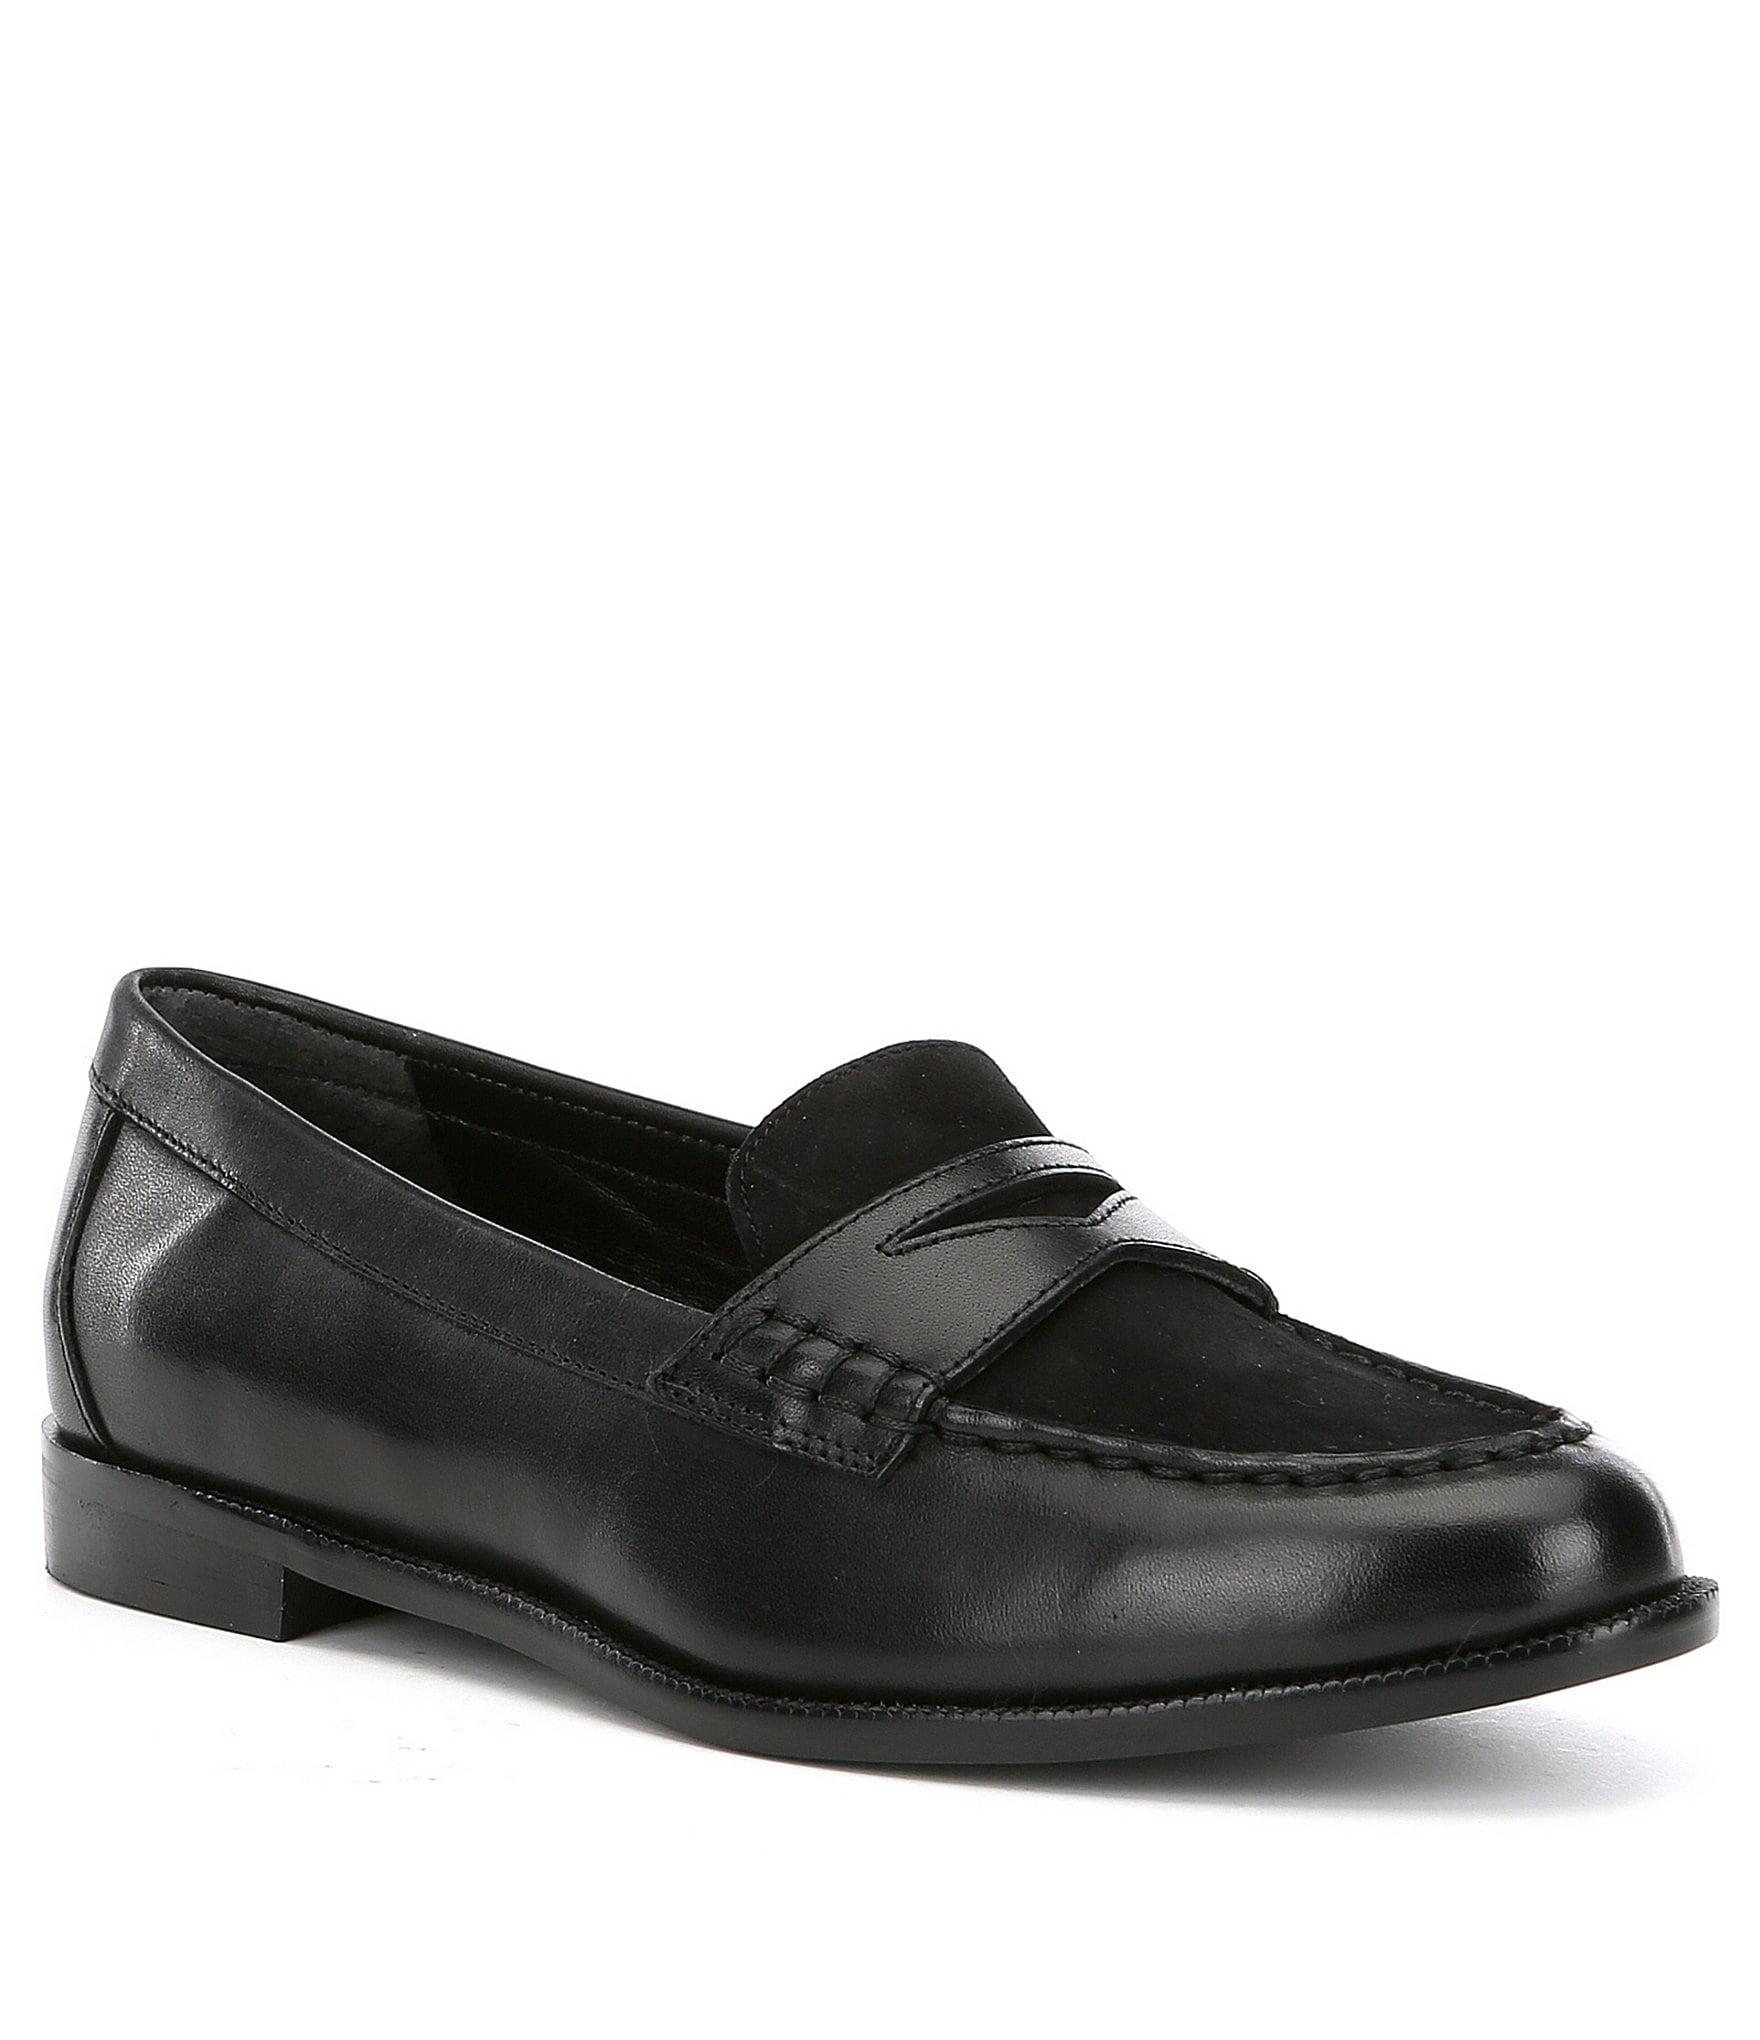 Black dress up shoes 002